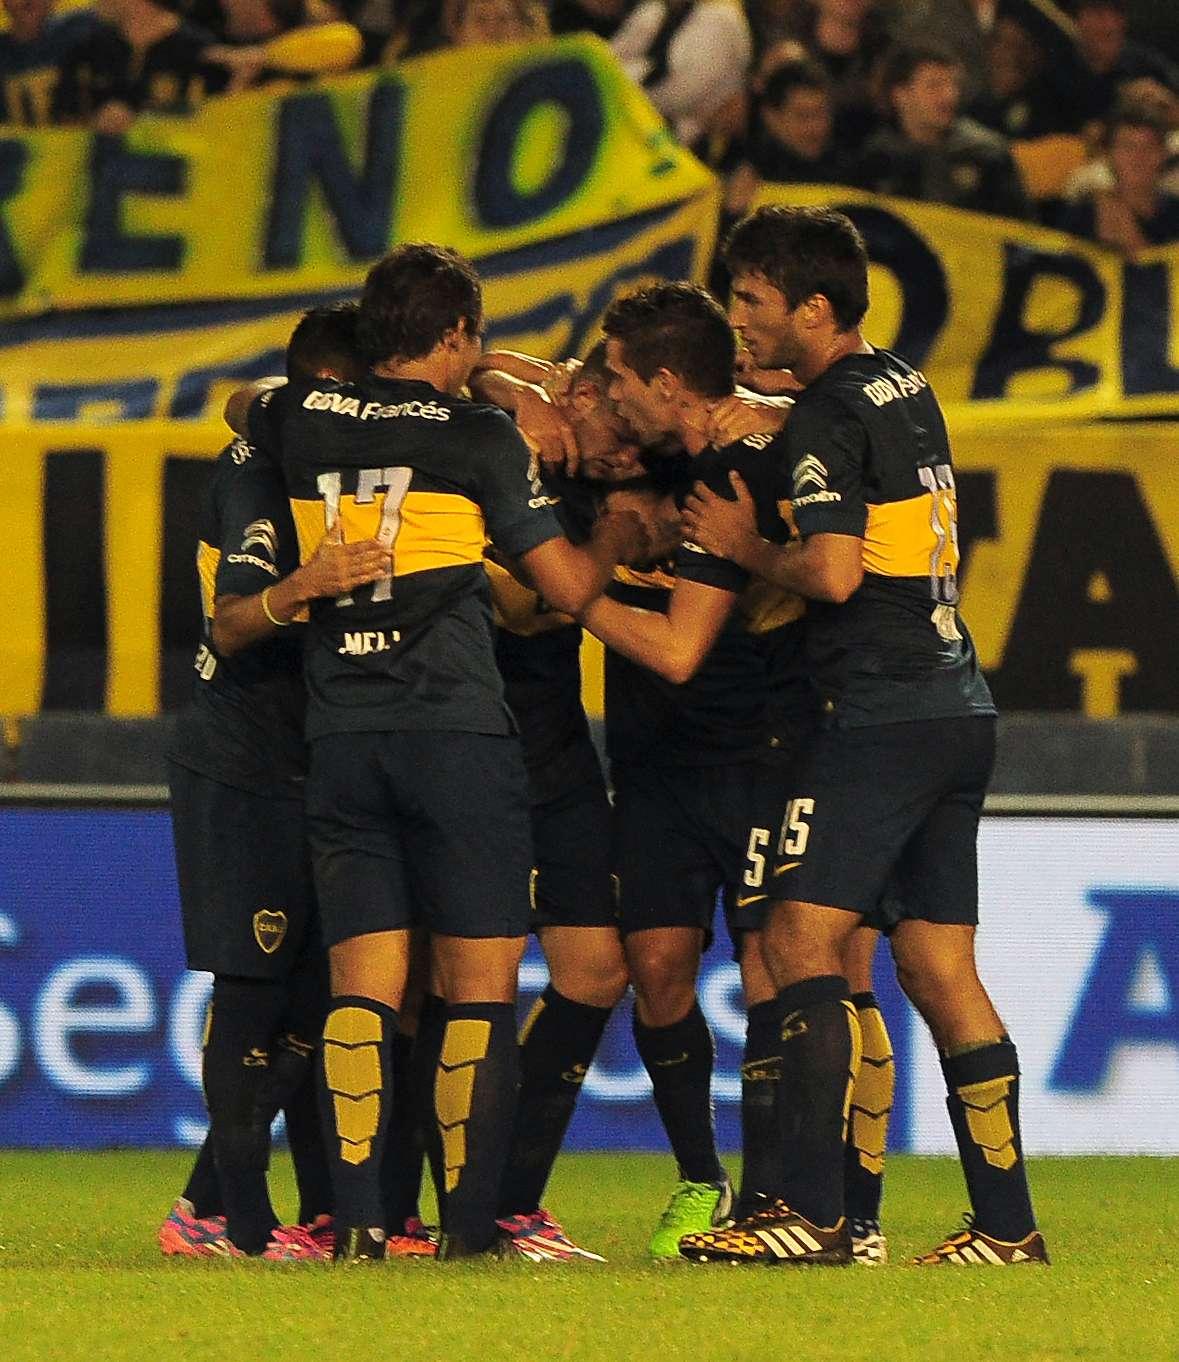 Todos abrazan a Colazo, autor de un golazo. Foto: Noticias Argentinas